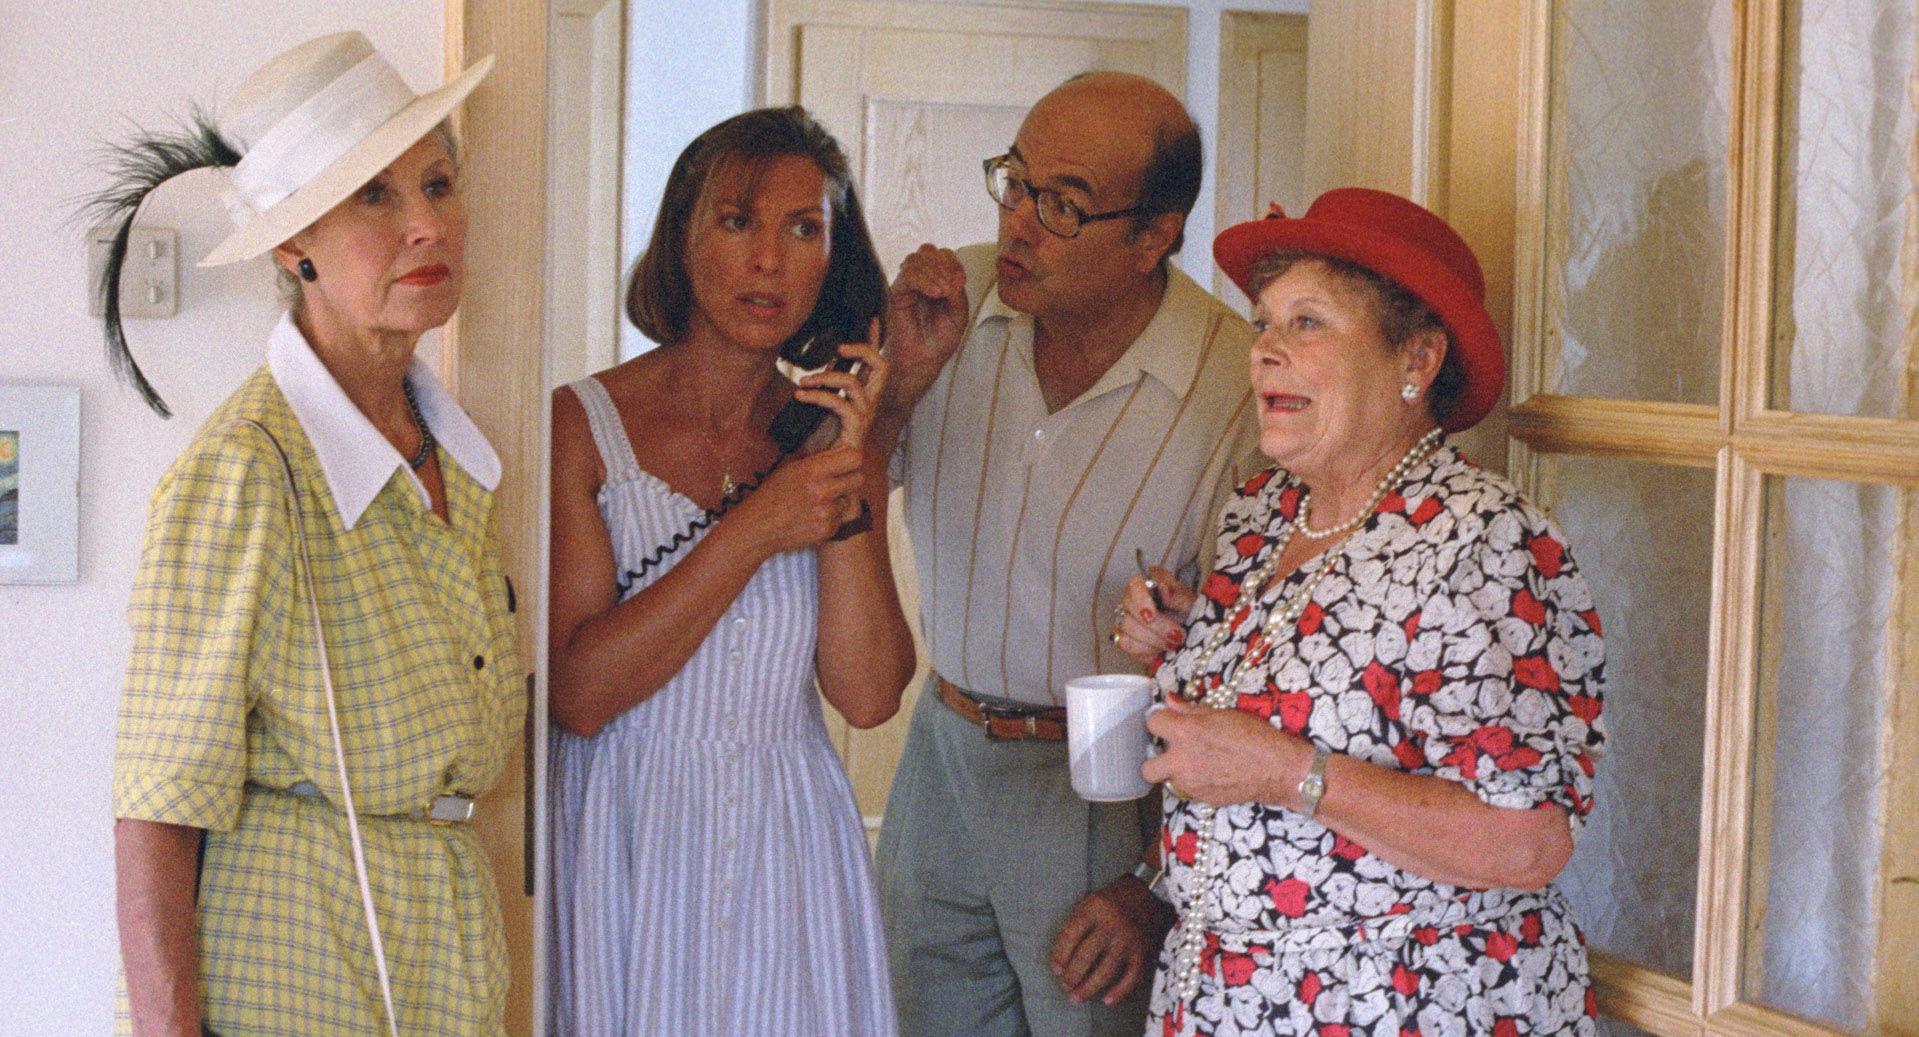 Lotte Ledl (Renates Mutter), Claudia Kment (Sigis Frau - Renate), Peter Fröhlich (Renates Vater), Hilde Sochor (Renates Oma)